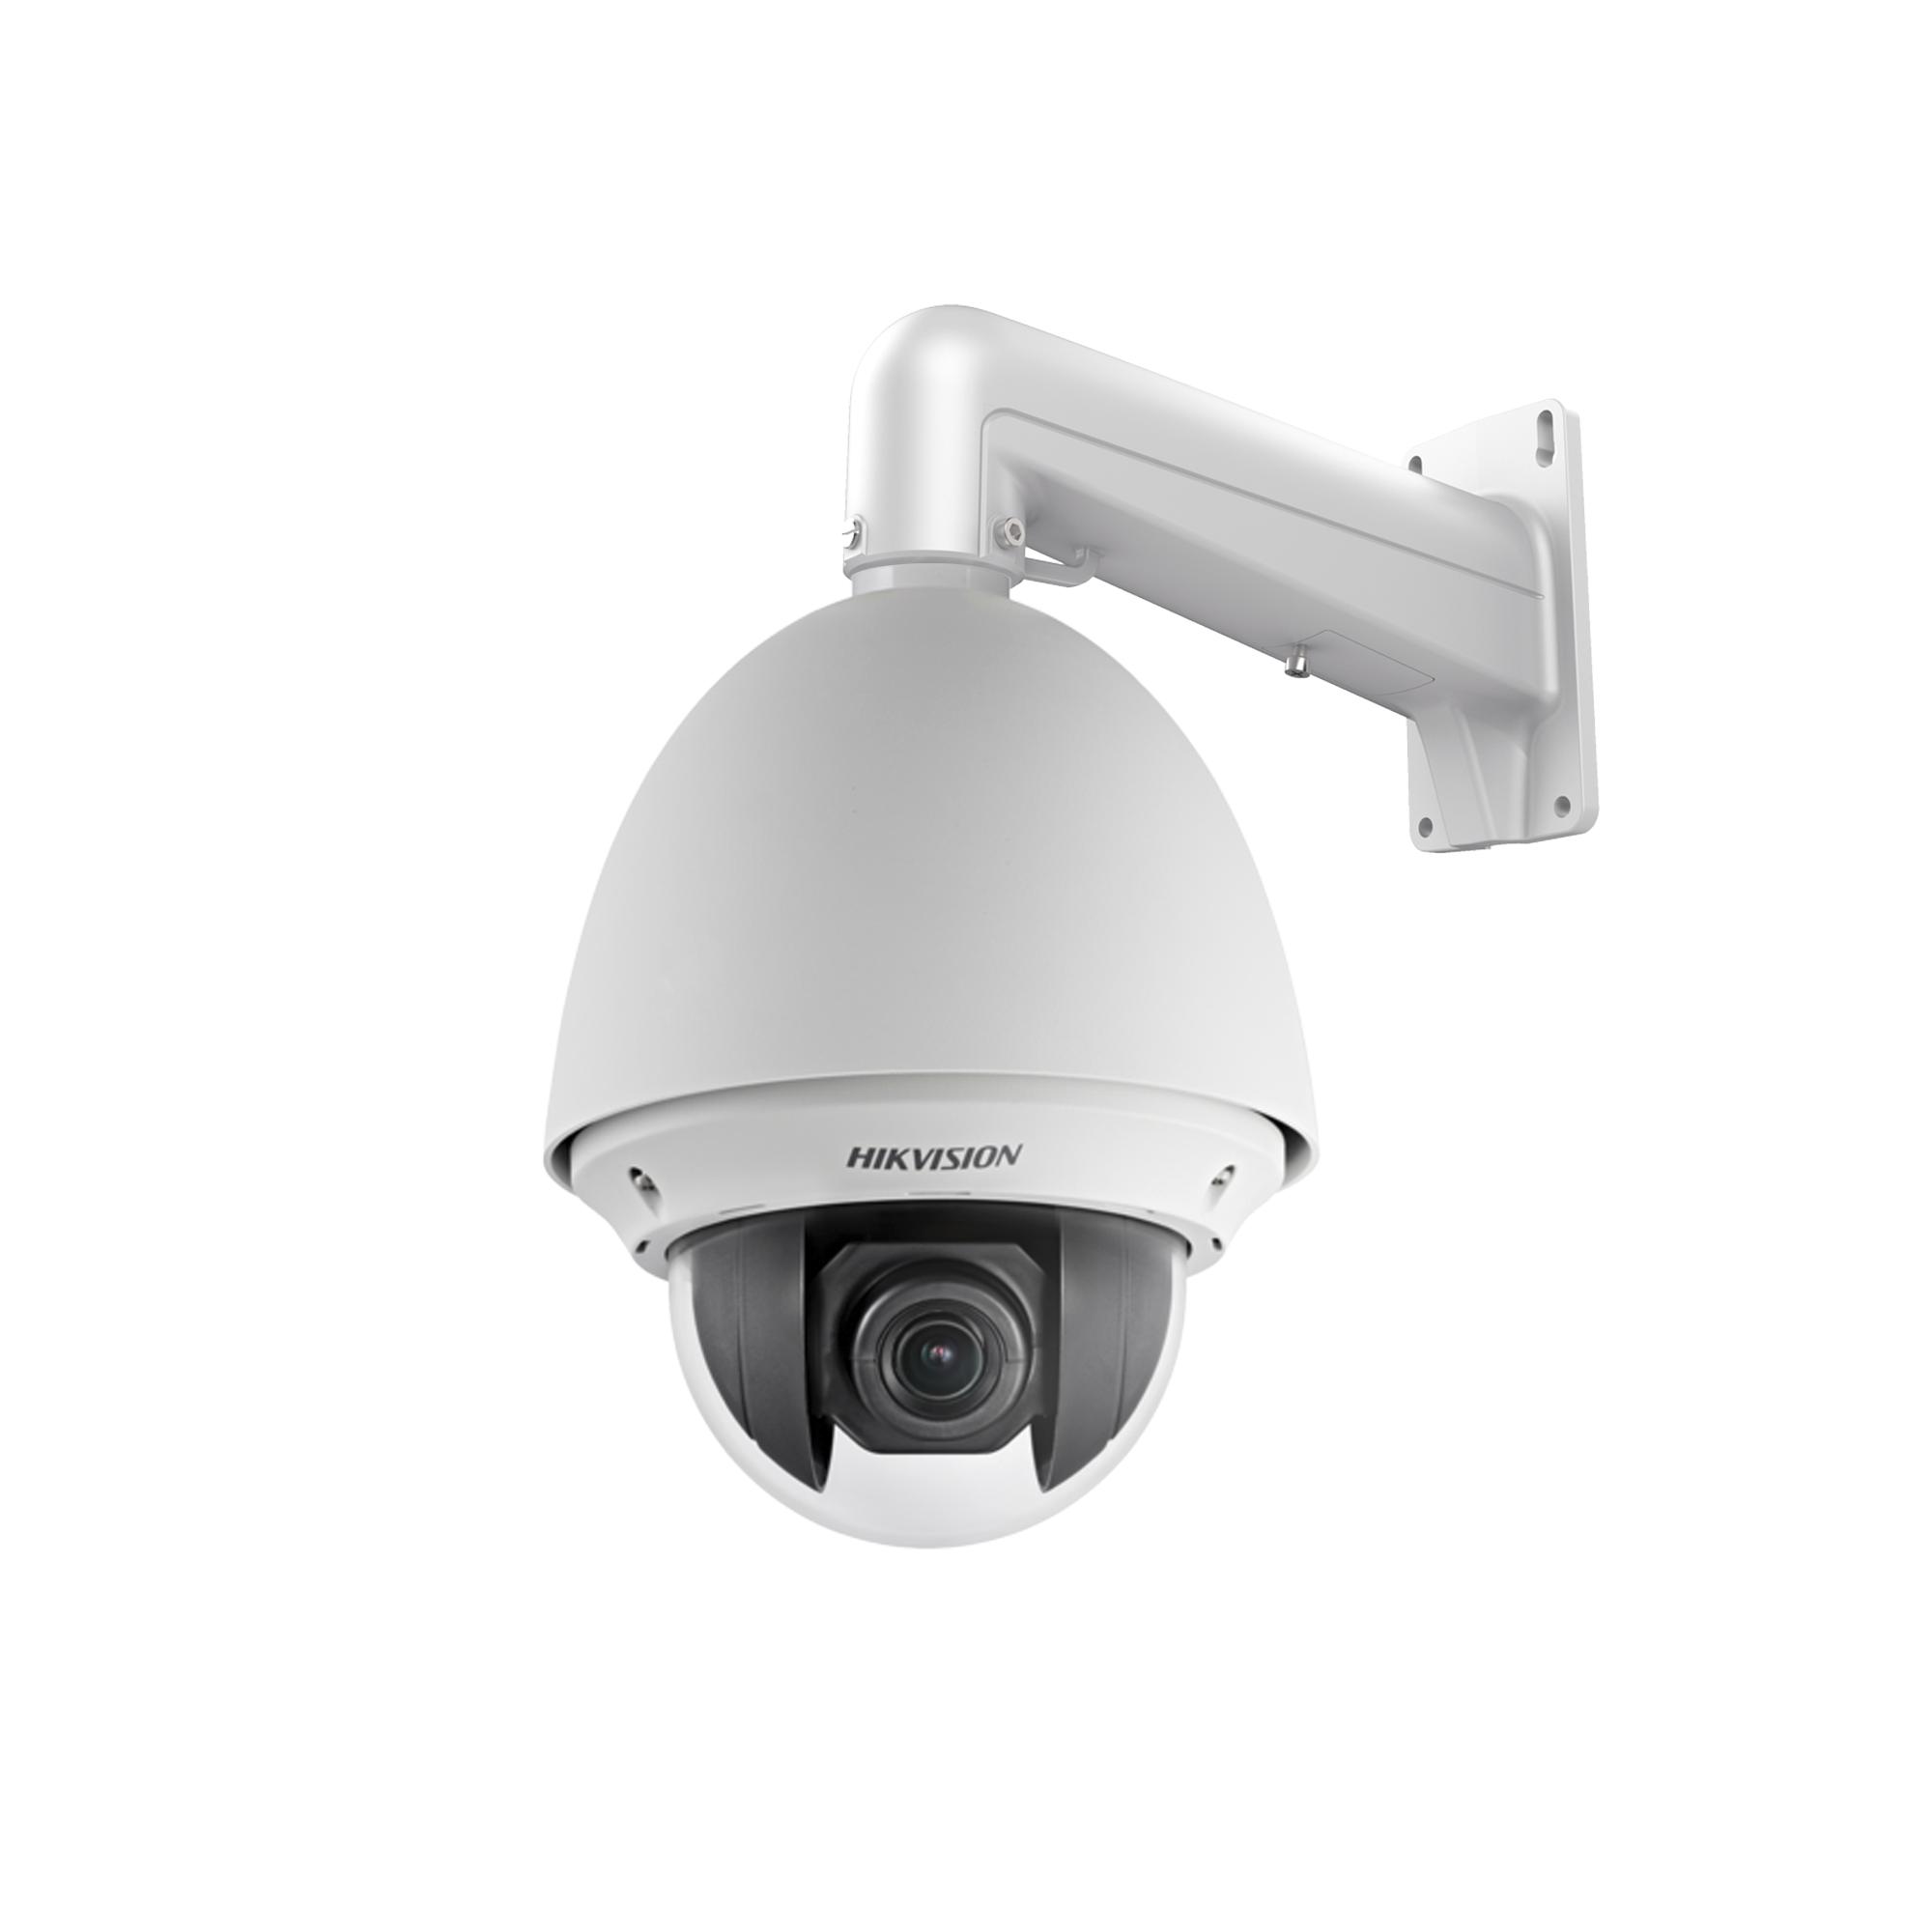 Domo IP PTZ 2 Megapixel / 25X Zoom / H.265+ / PoE+/ Dia-Noche ICR Real / WDR 120 dB / IP66 / HLC / Defog / EIS / Ultra Baja Iluminación